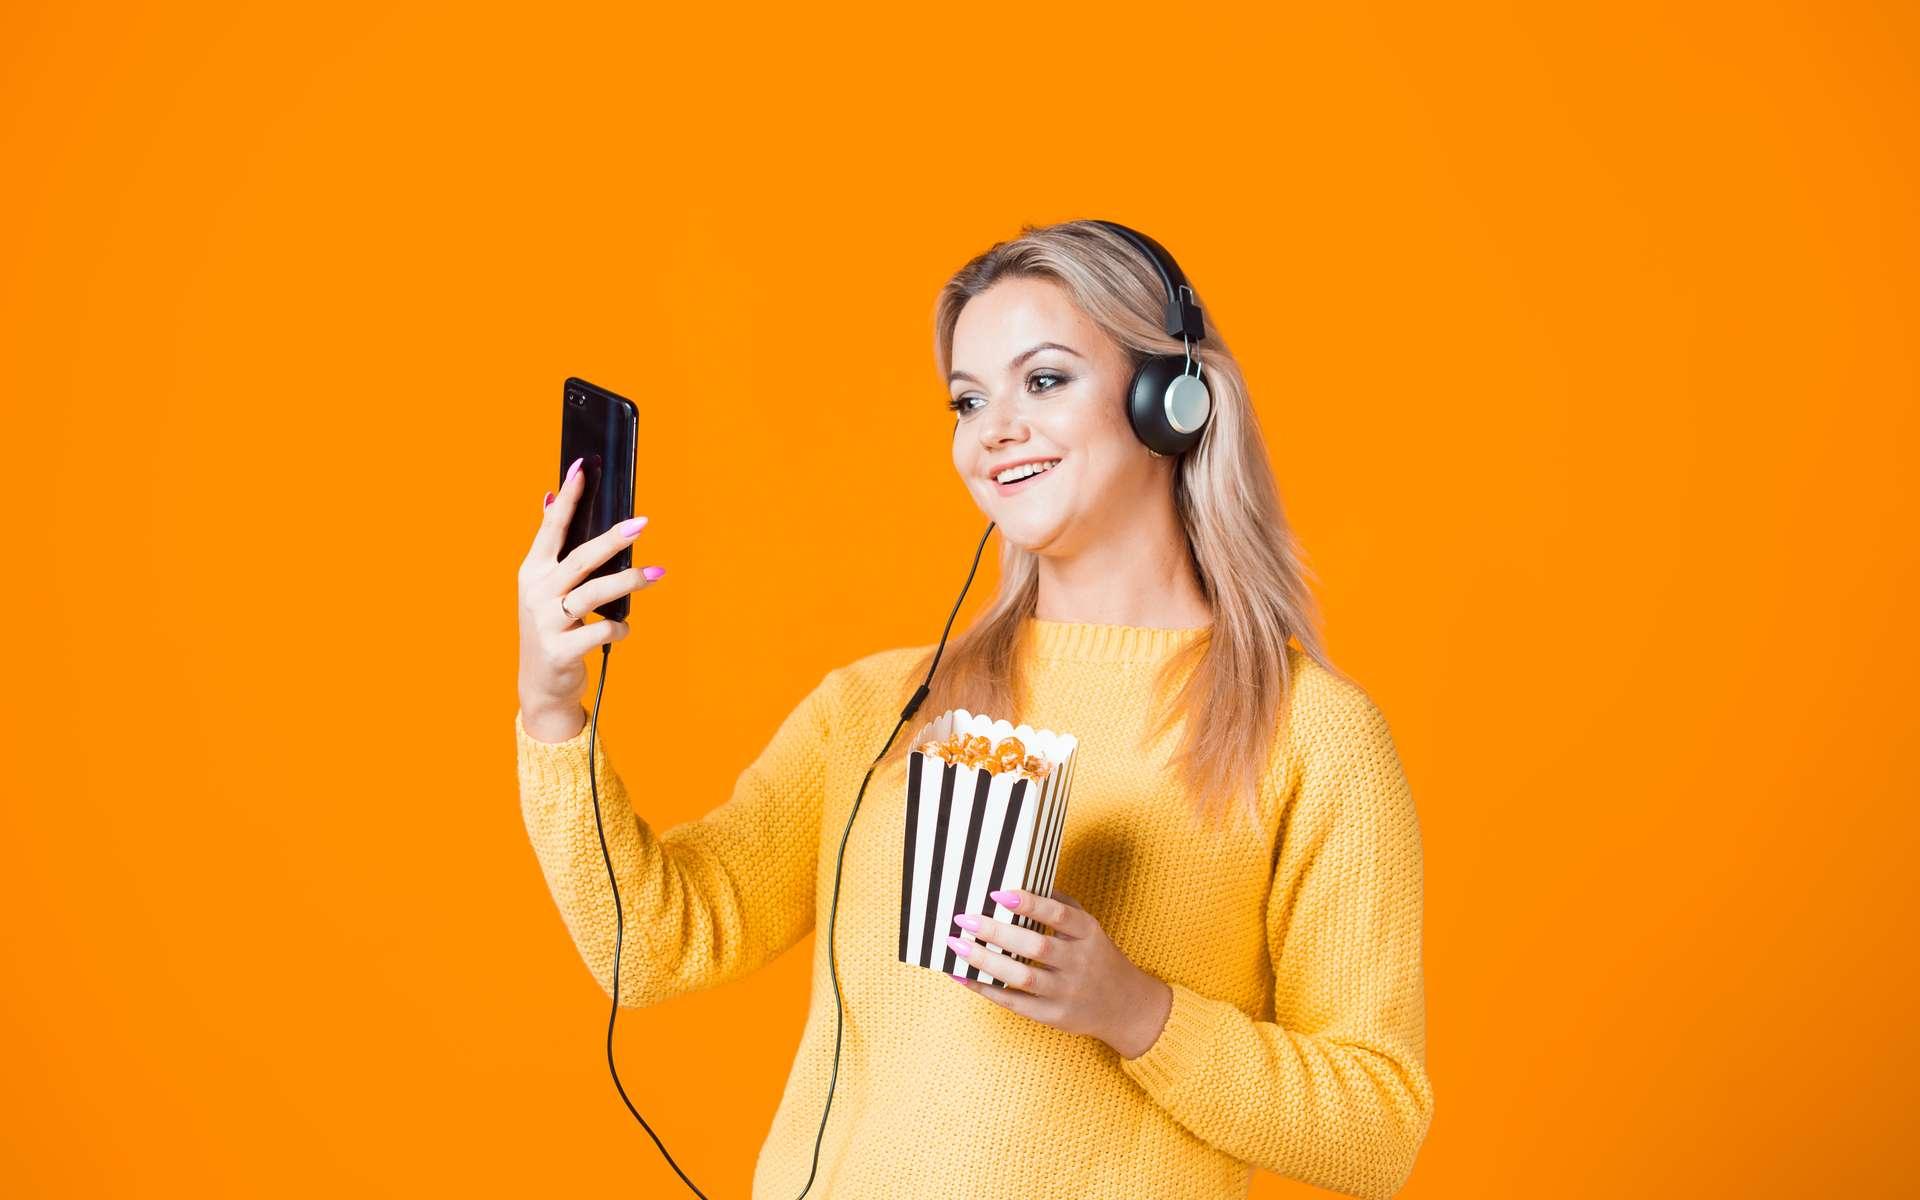 Offre à prix cassé Free Mobile © Alexander, Adobe Stock